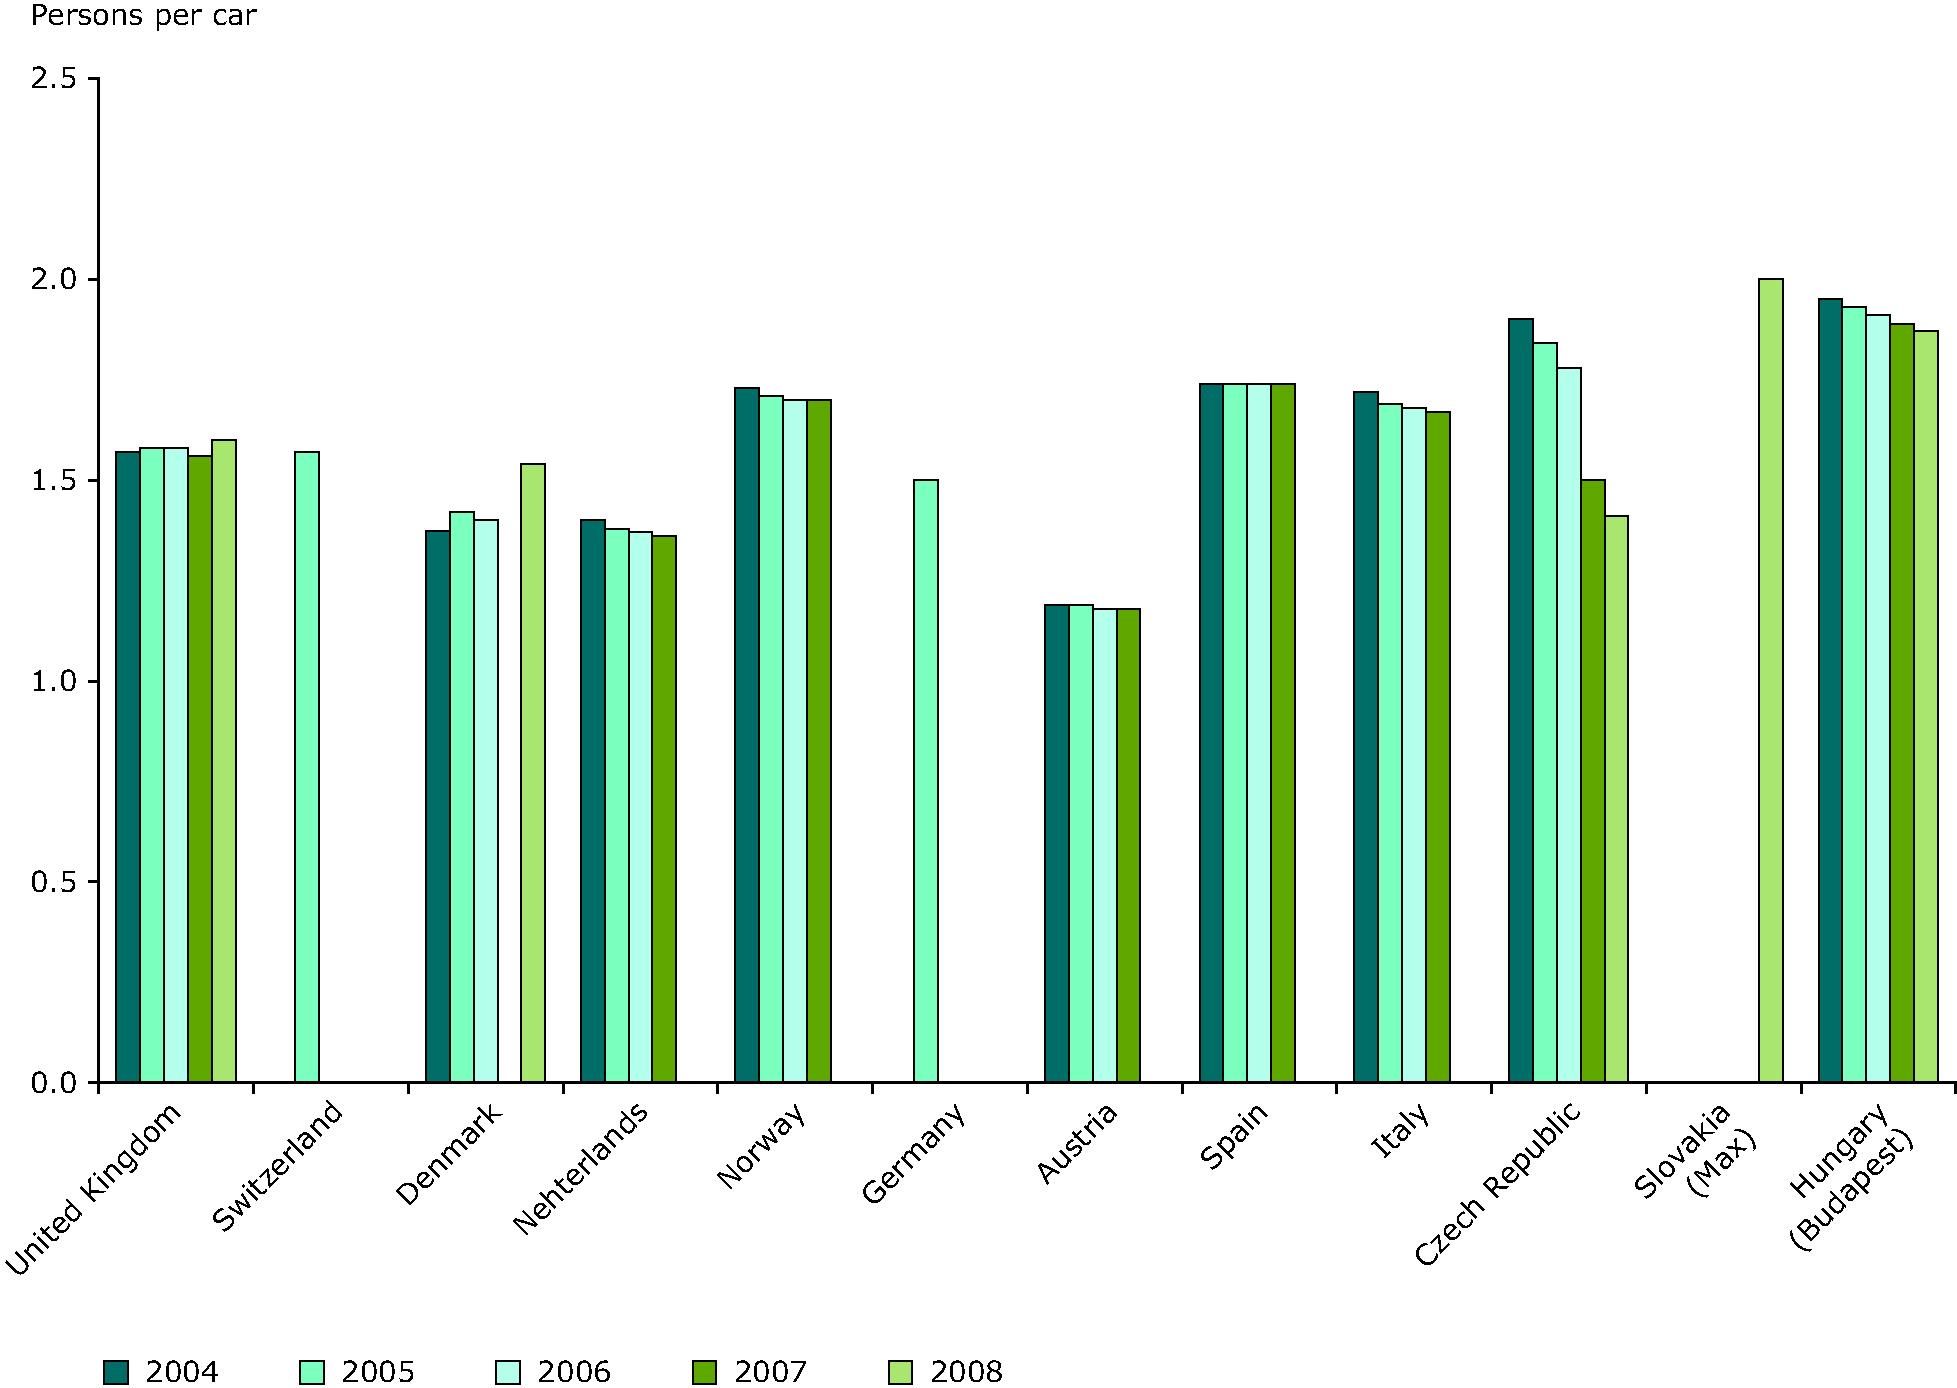 Car occupancy rates